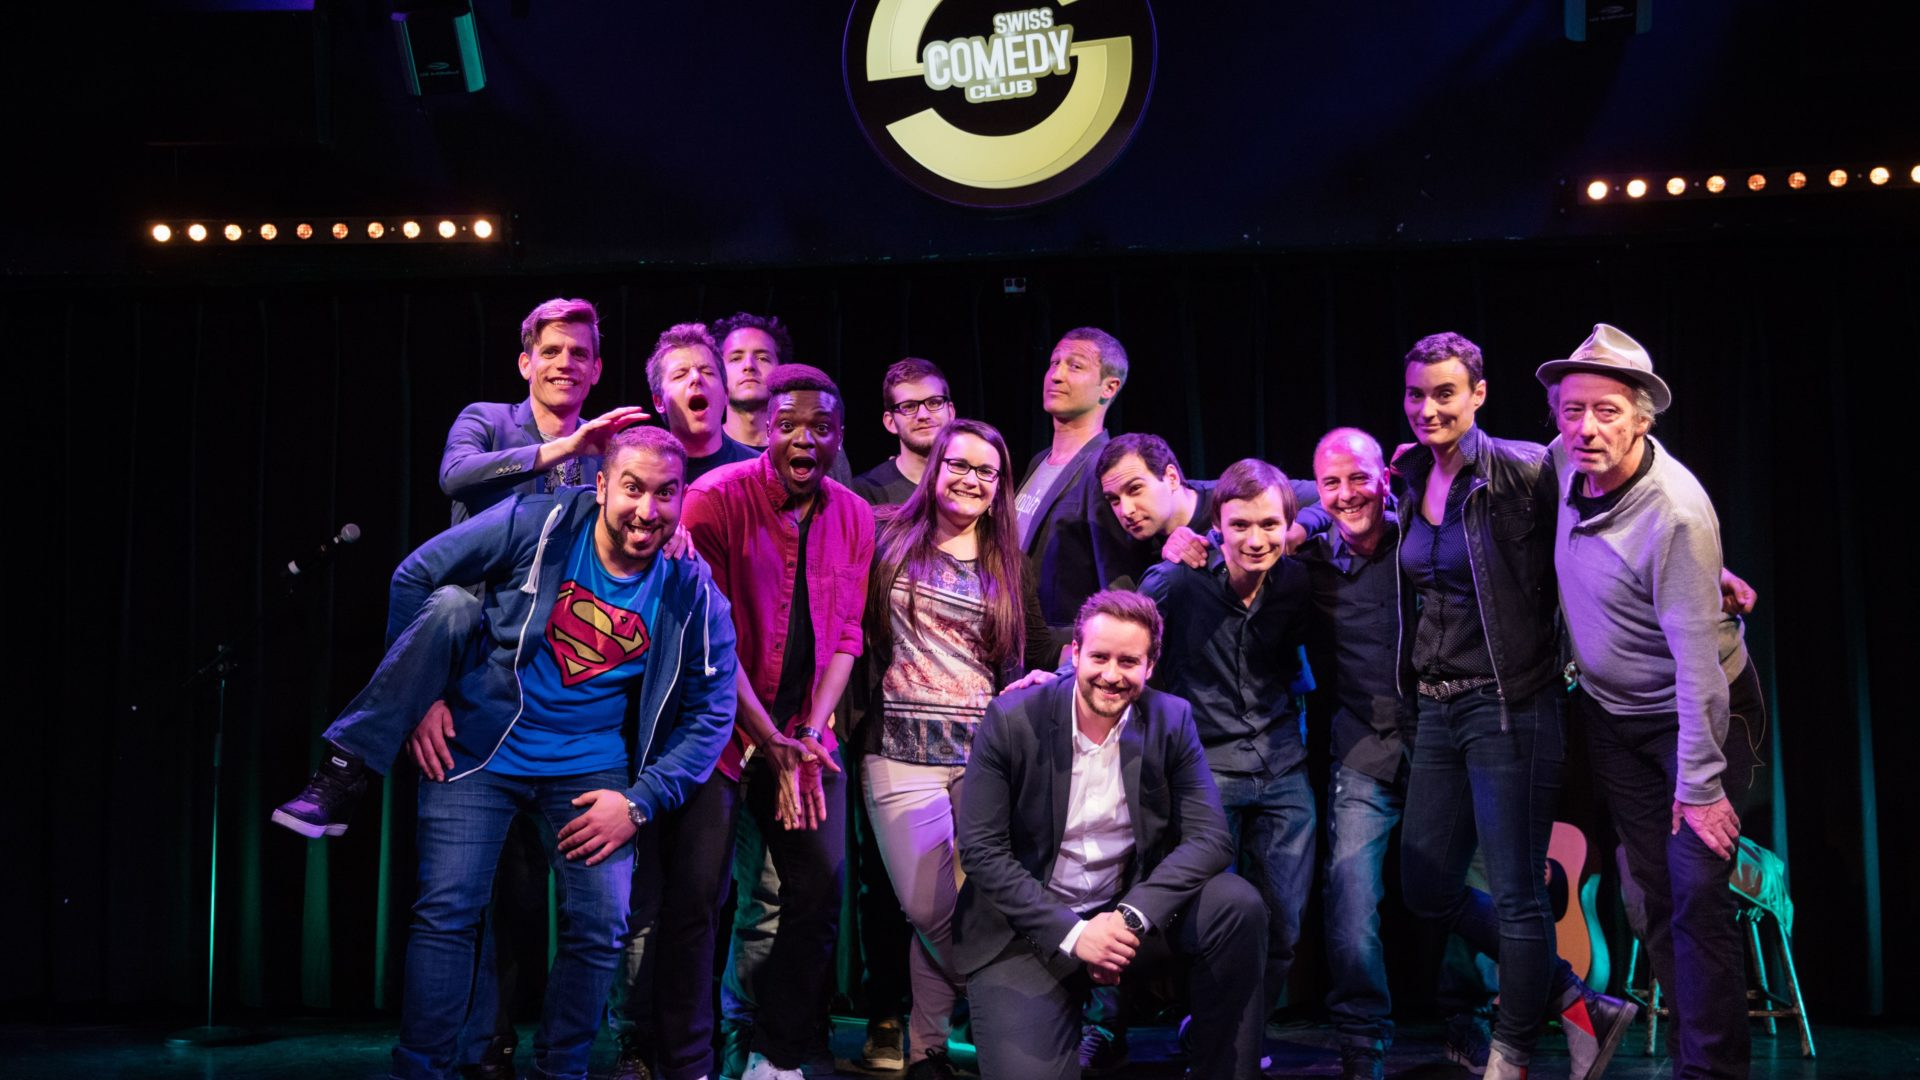 CPO, Swiss Comedy Club & friends